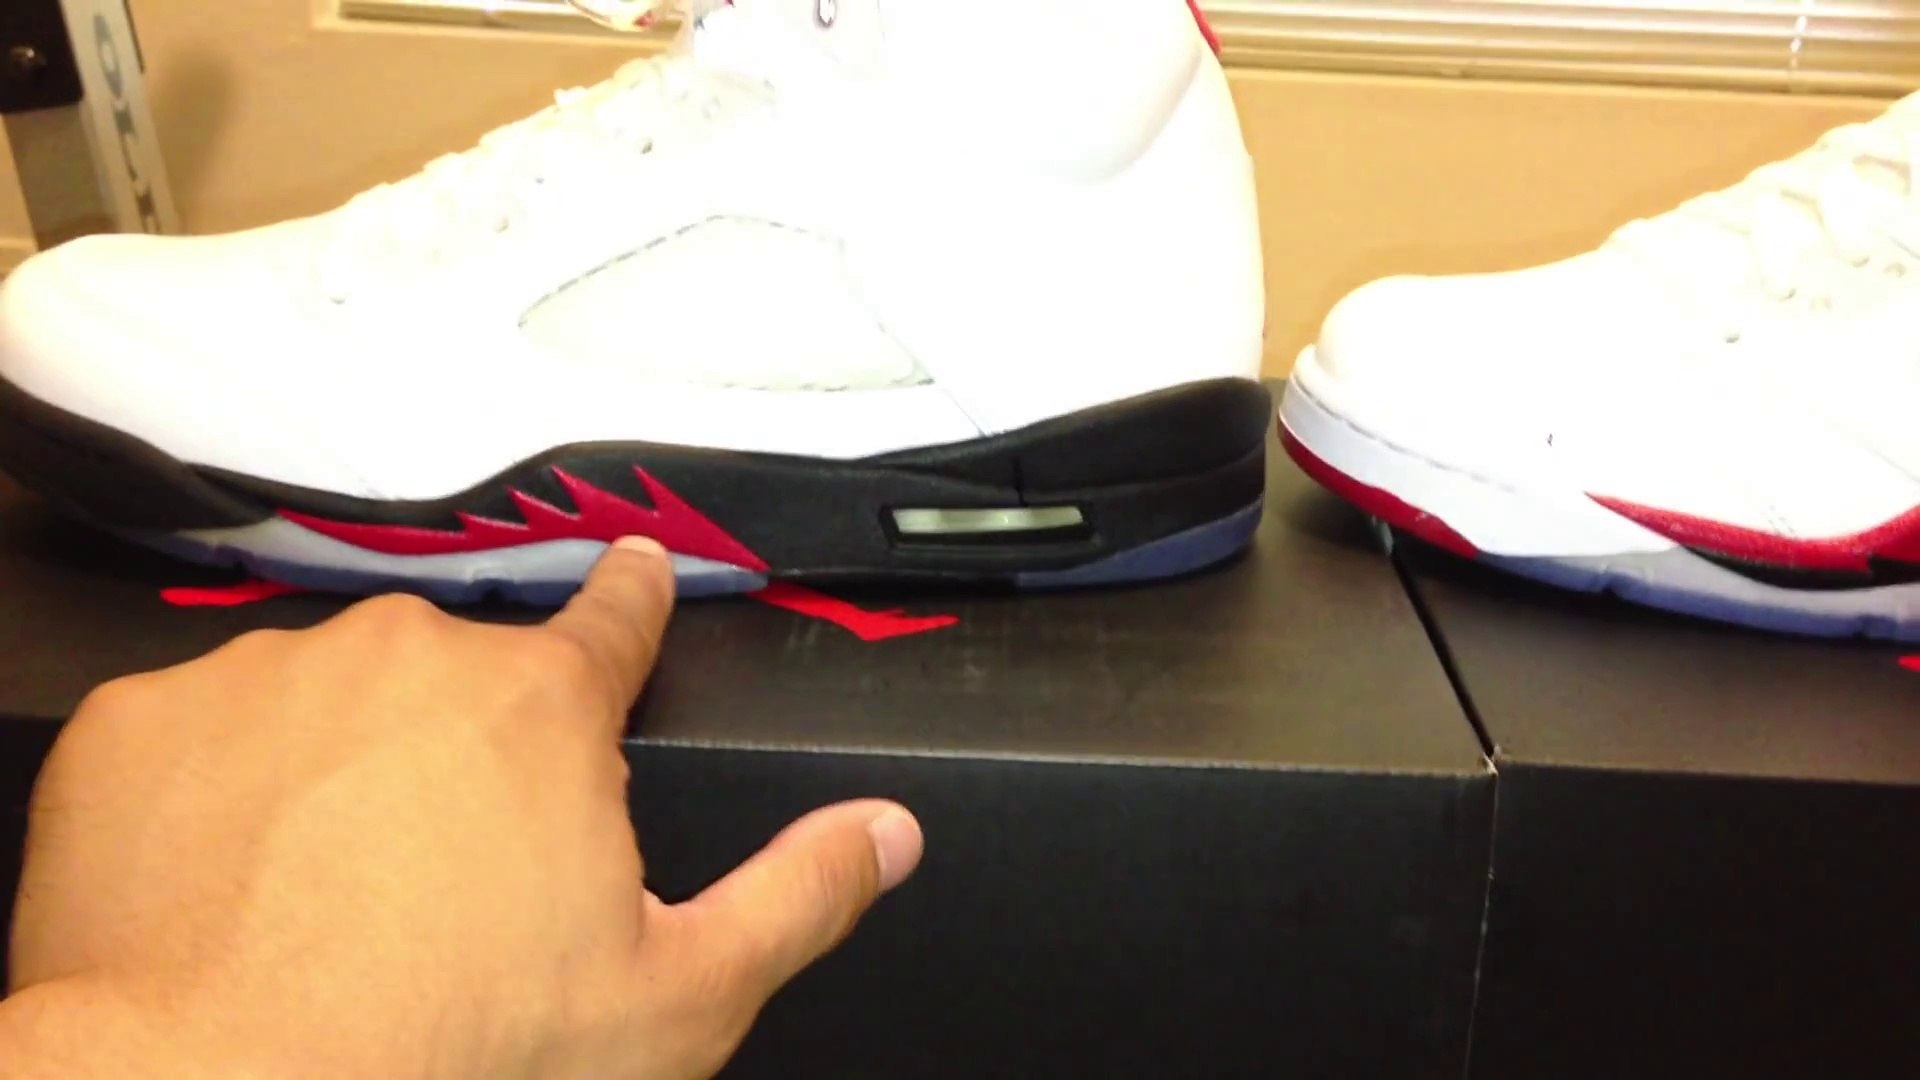 Cheap Air Jordan Shoes Free Shipping,Jordan Fire Red 5 3M vs Black Tongue